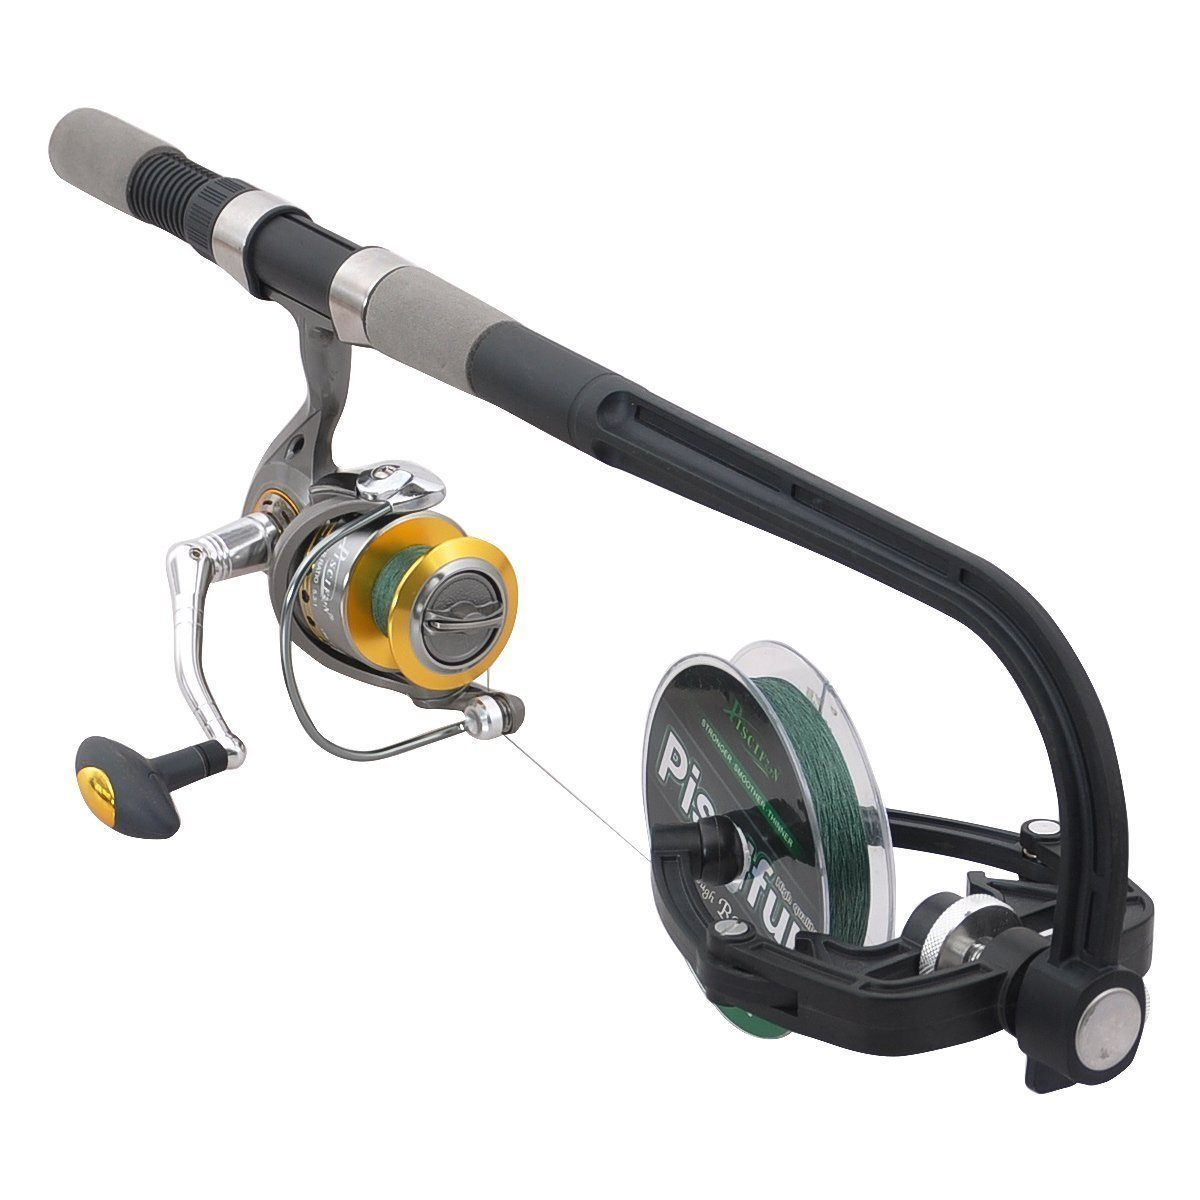 Piscifun Fishing Line Winder